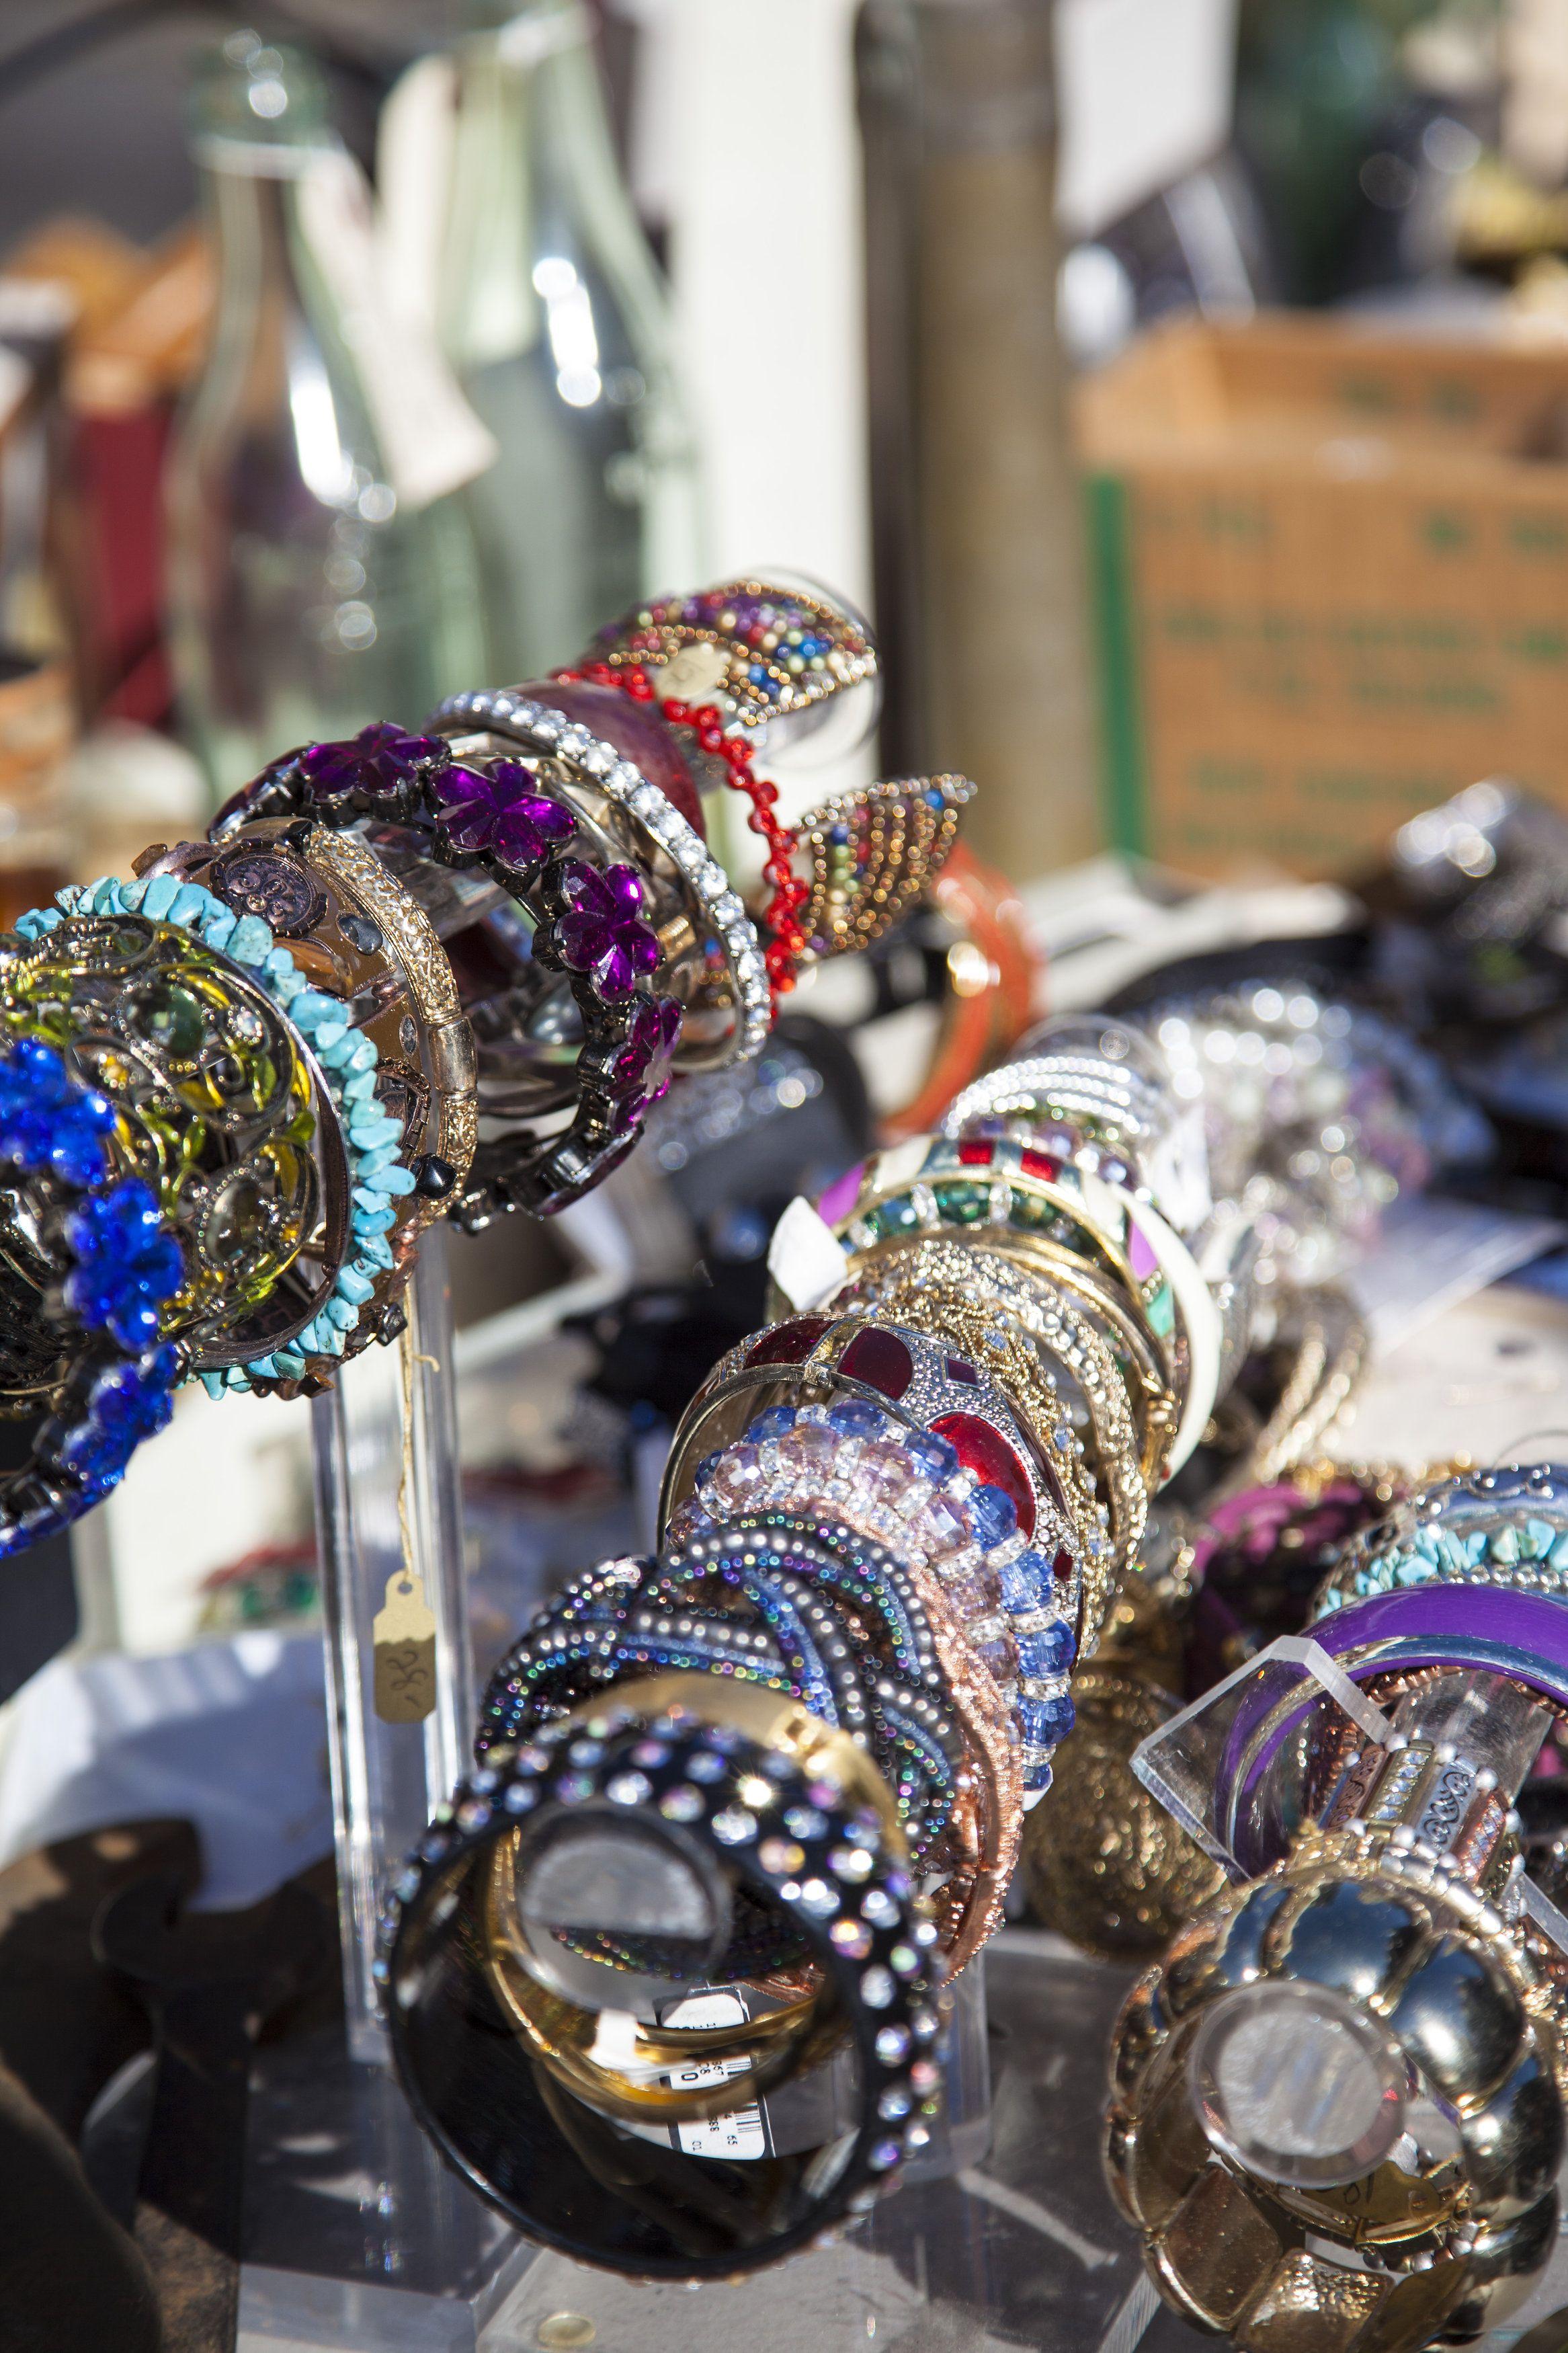 Holiday Gift Guide — Annex Markets: Chelsea Flea Market